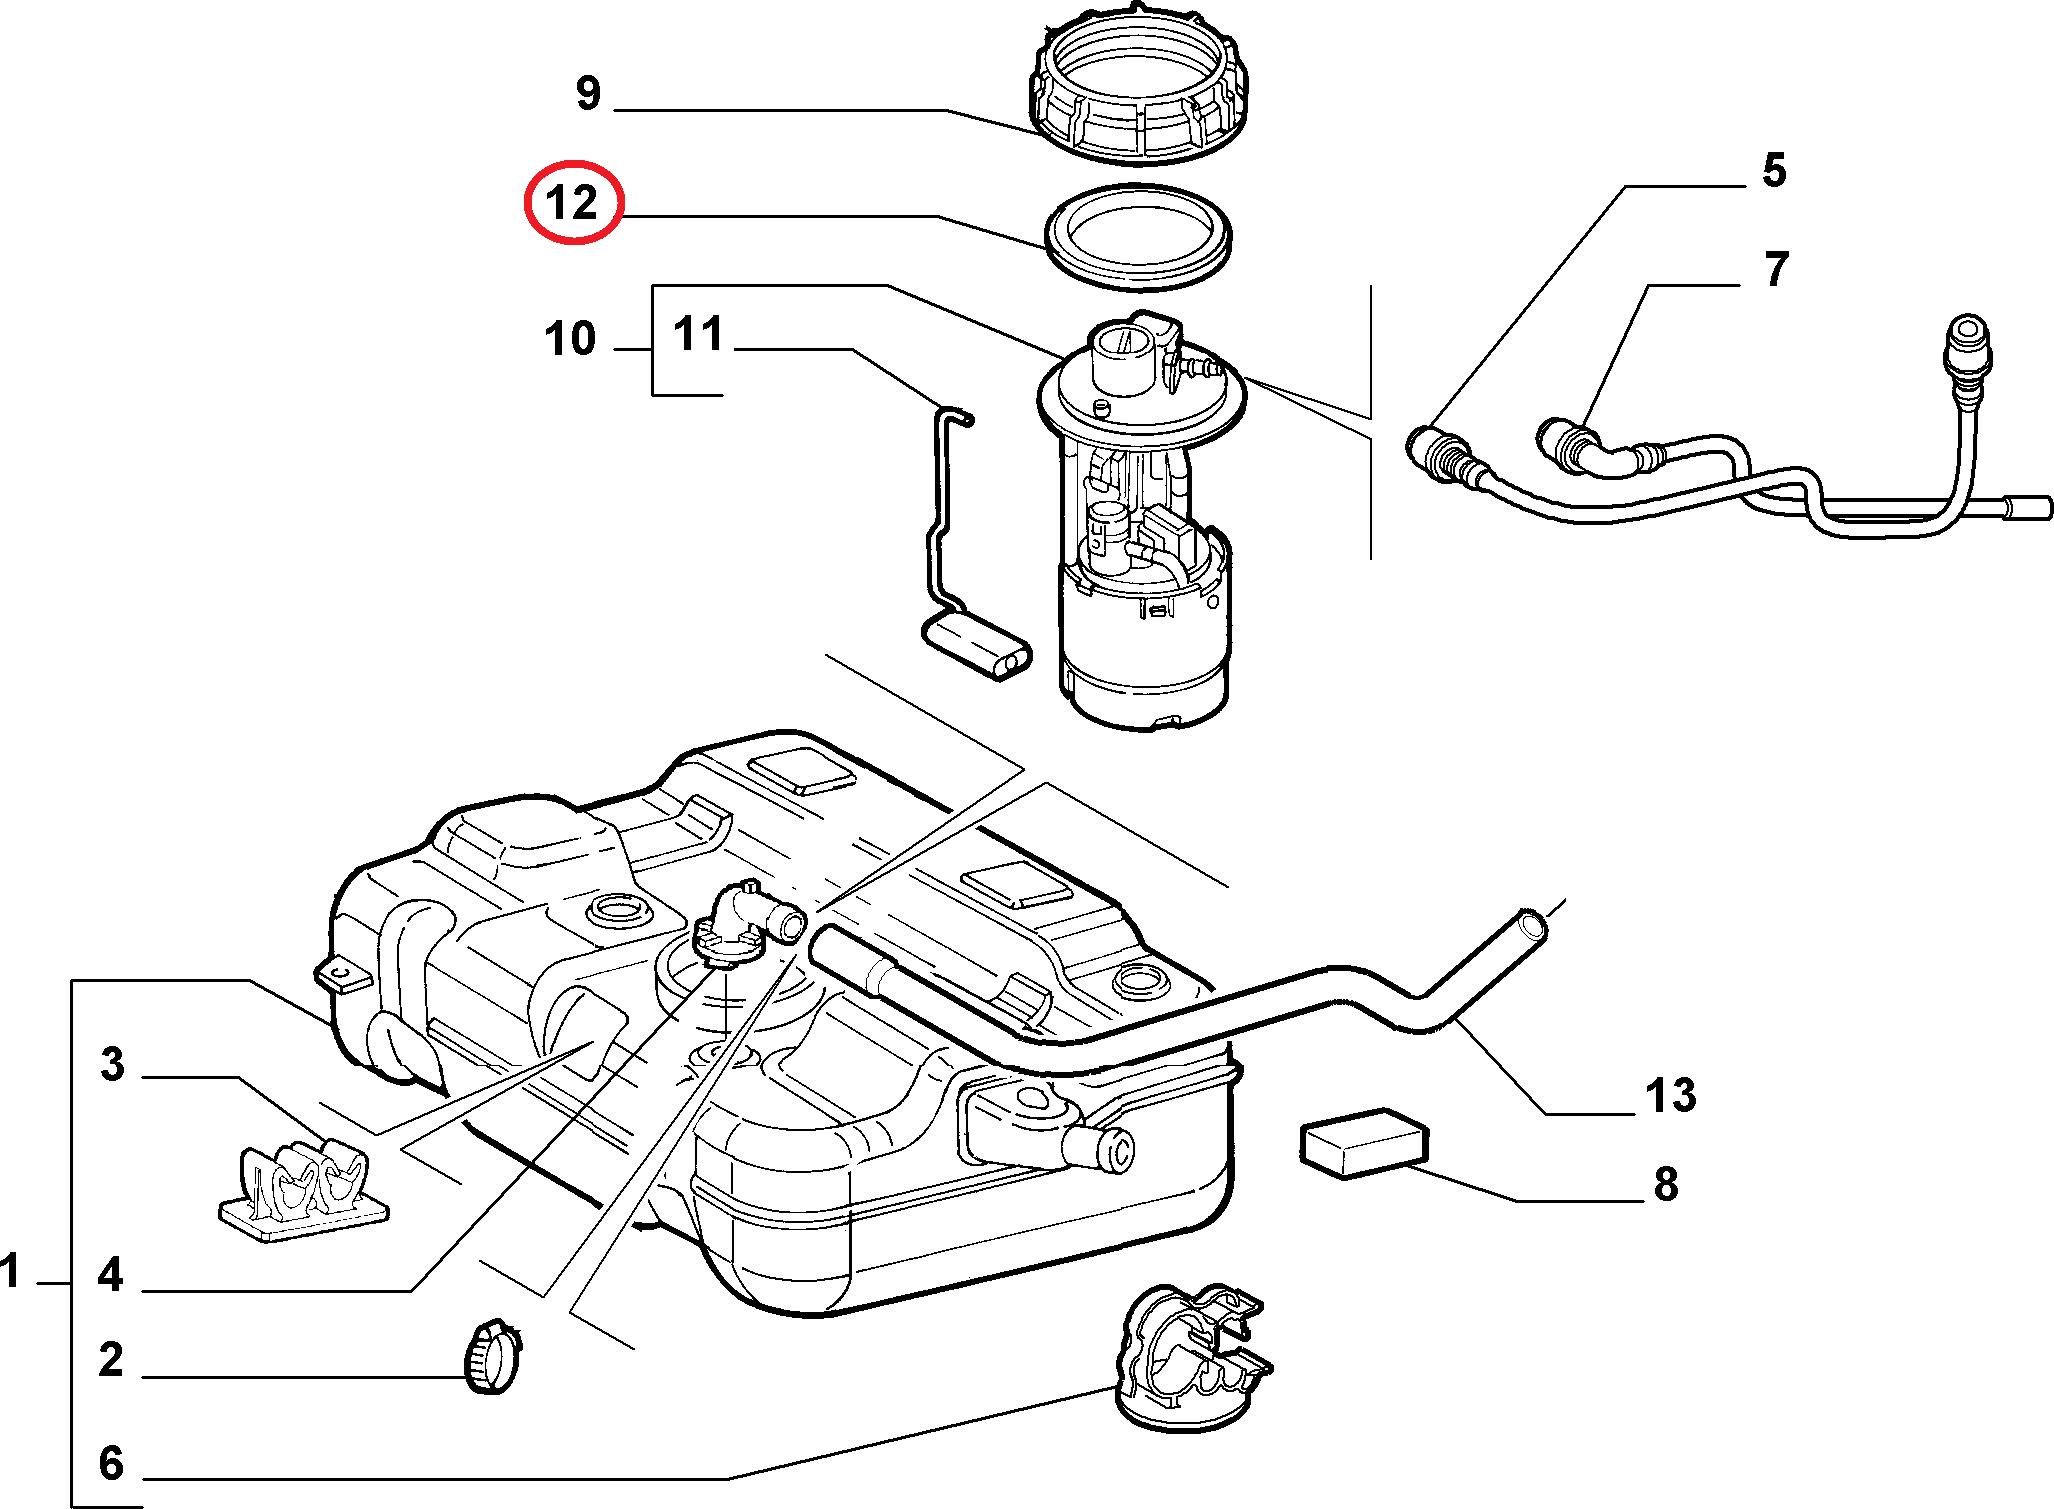 Прокладка крышки бензонасоса Fiat Doblo 1.4MPI 8V